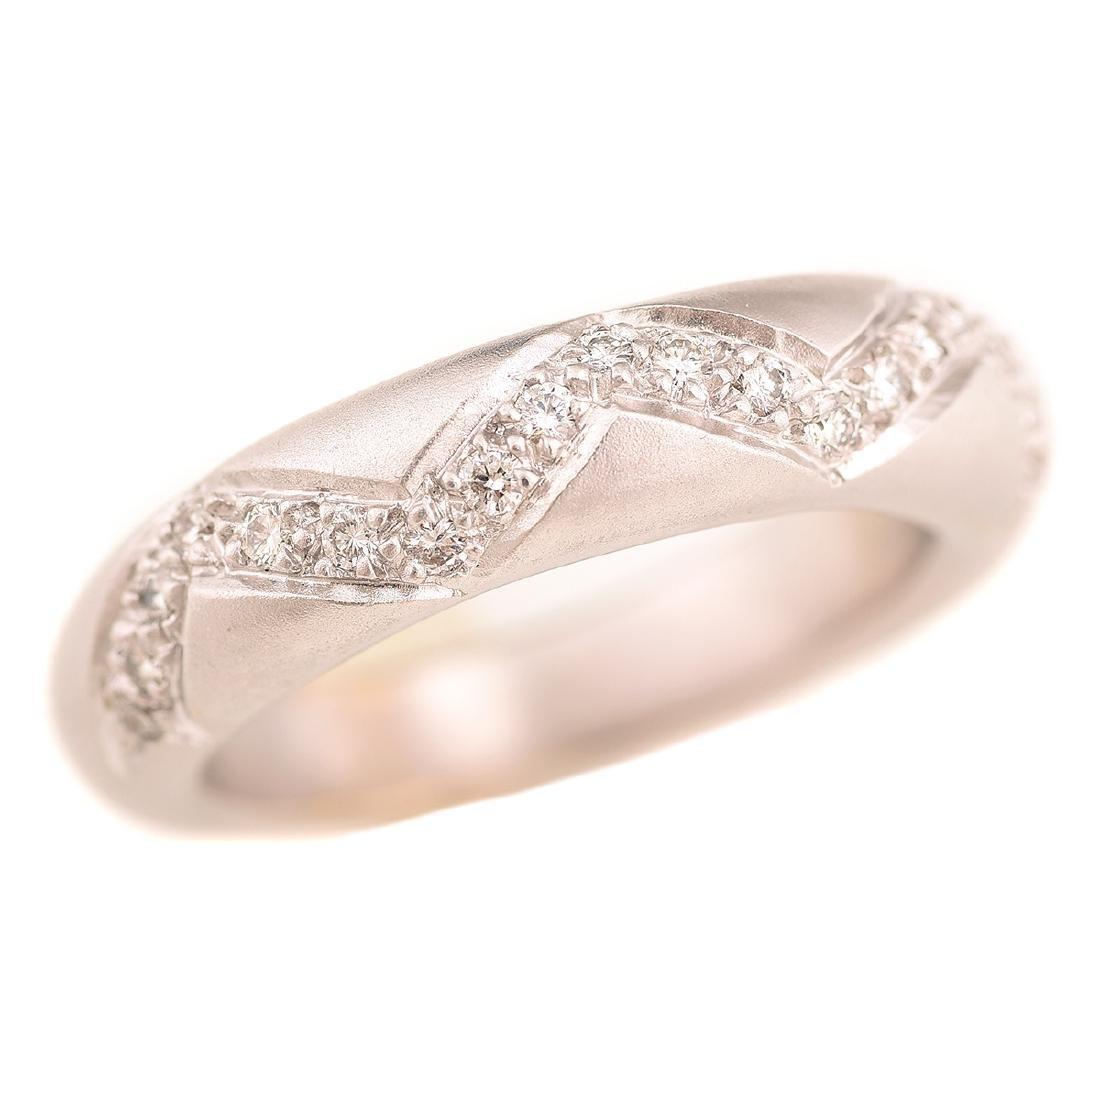 Diamond, 18k White Gold Ring.